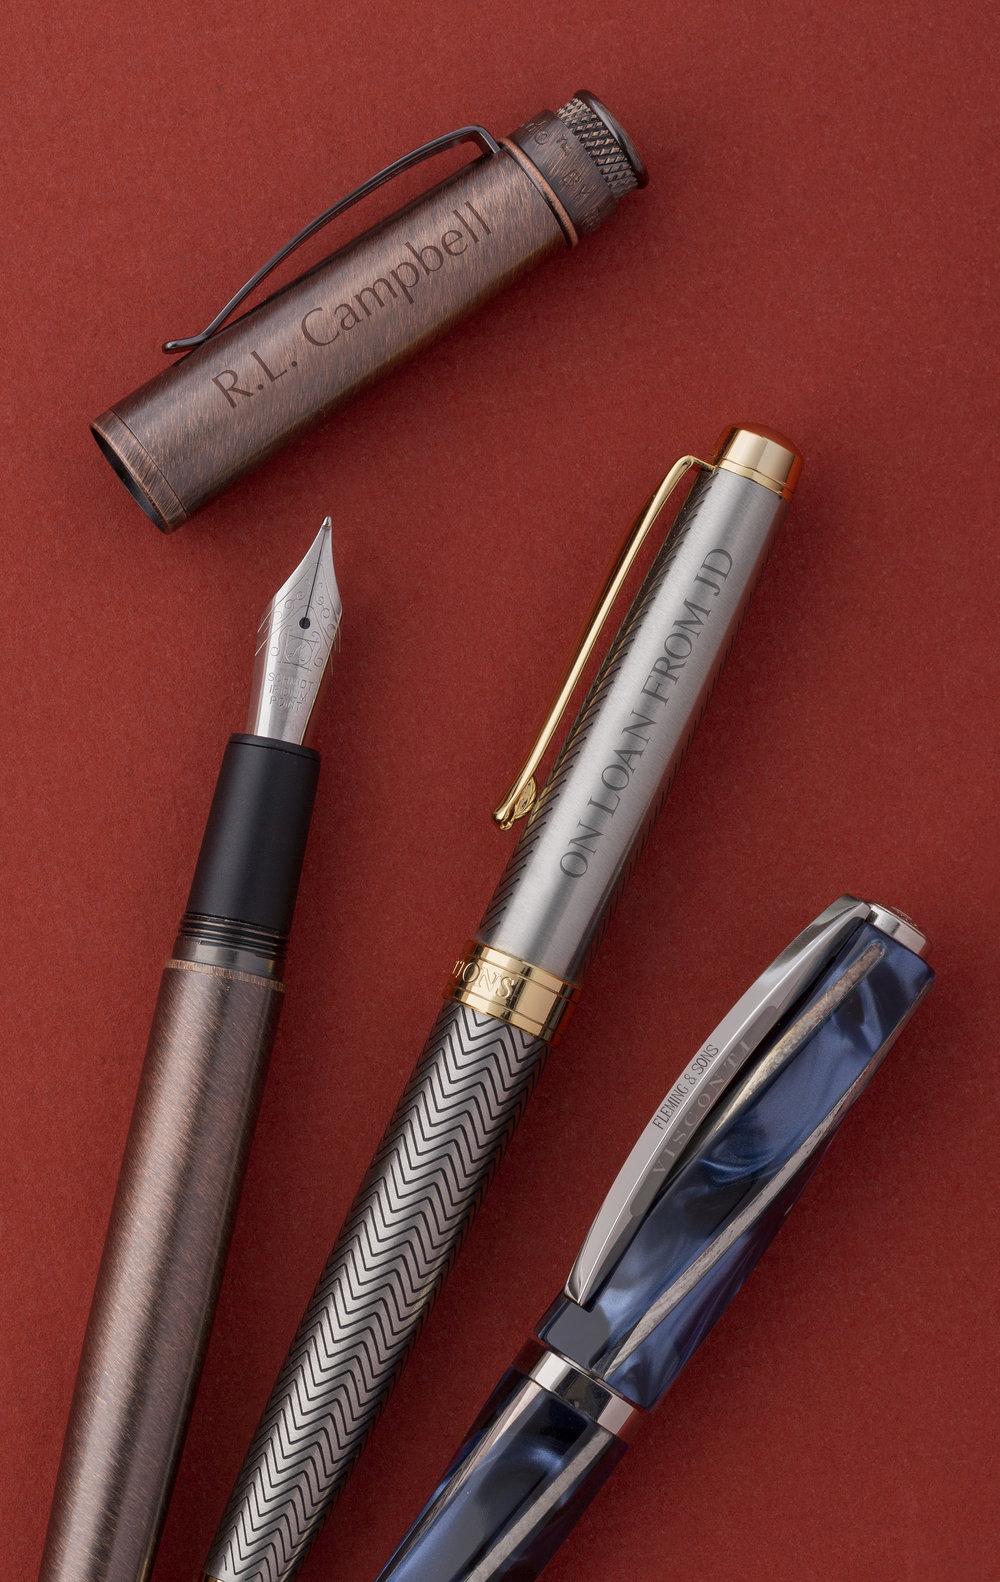 aF18_22x72_2b_pens.jpg